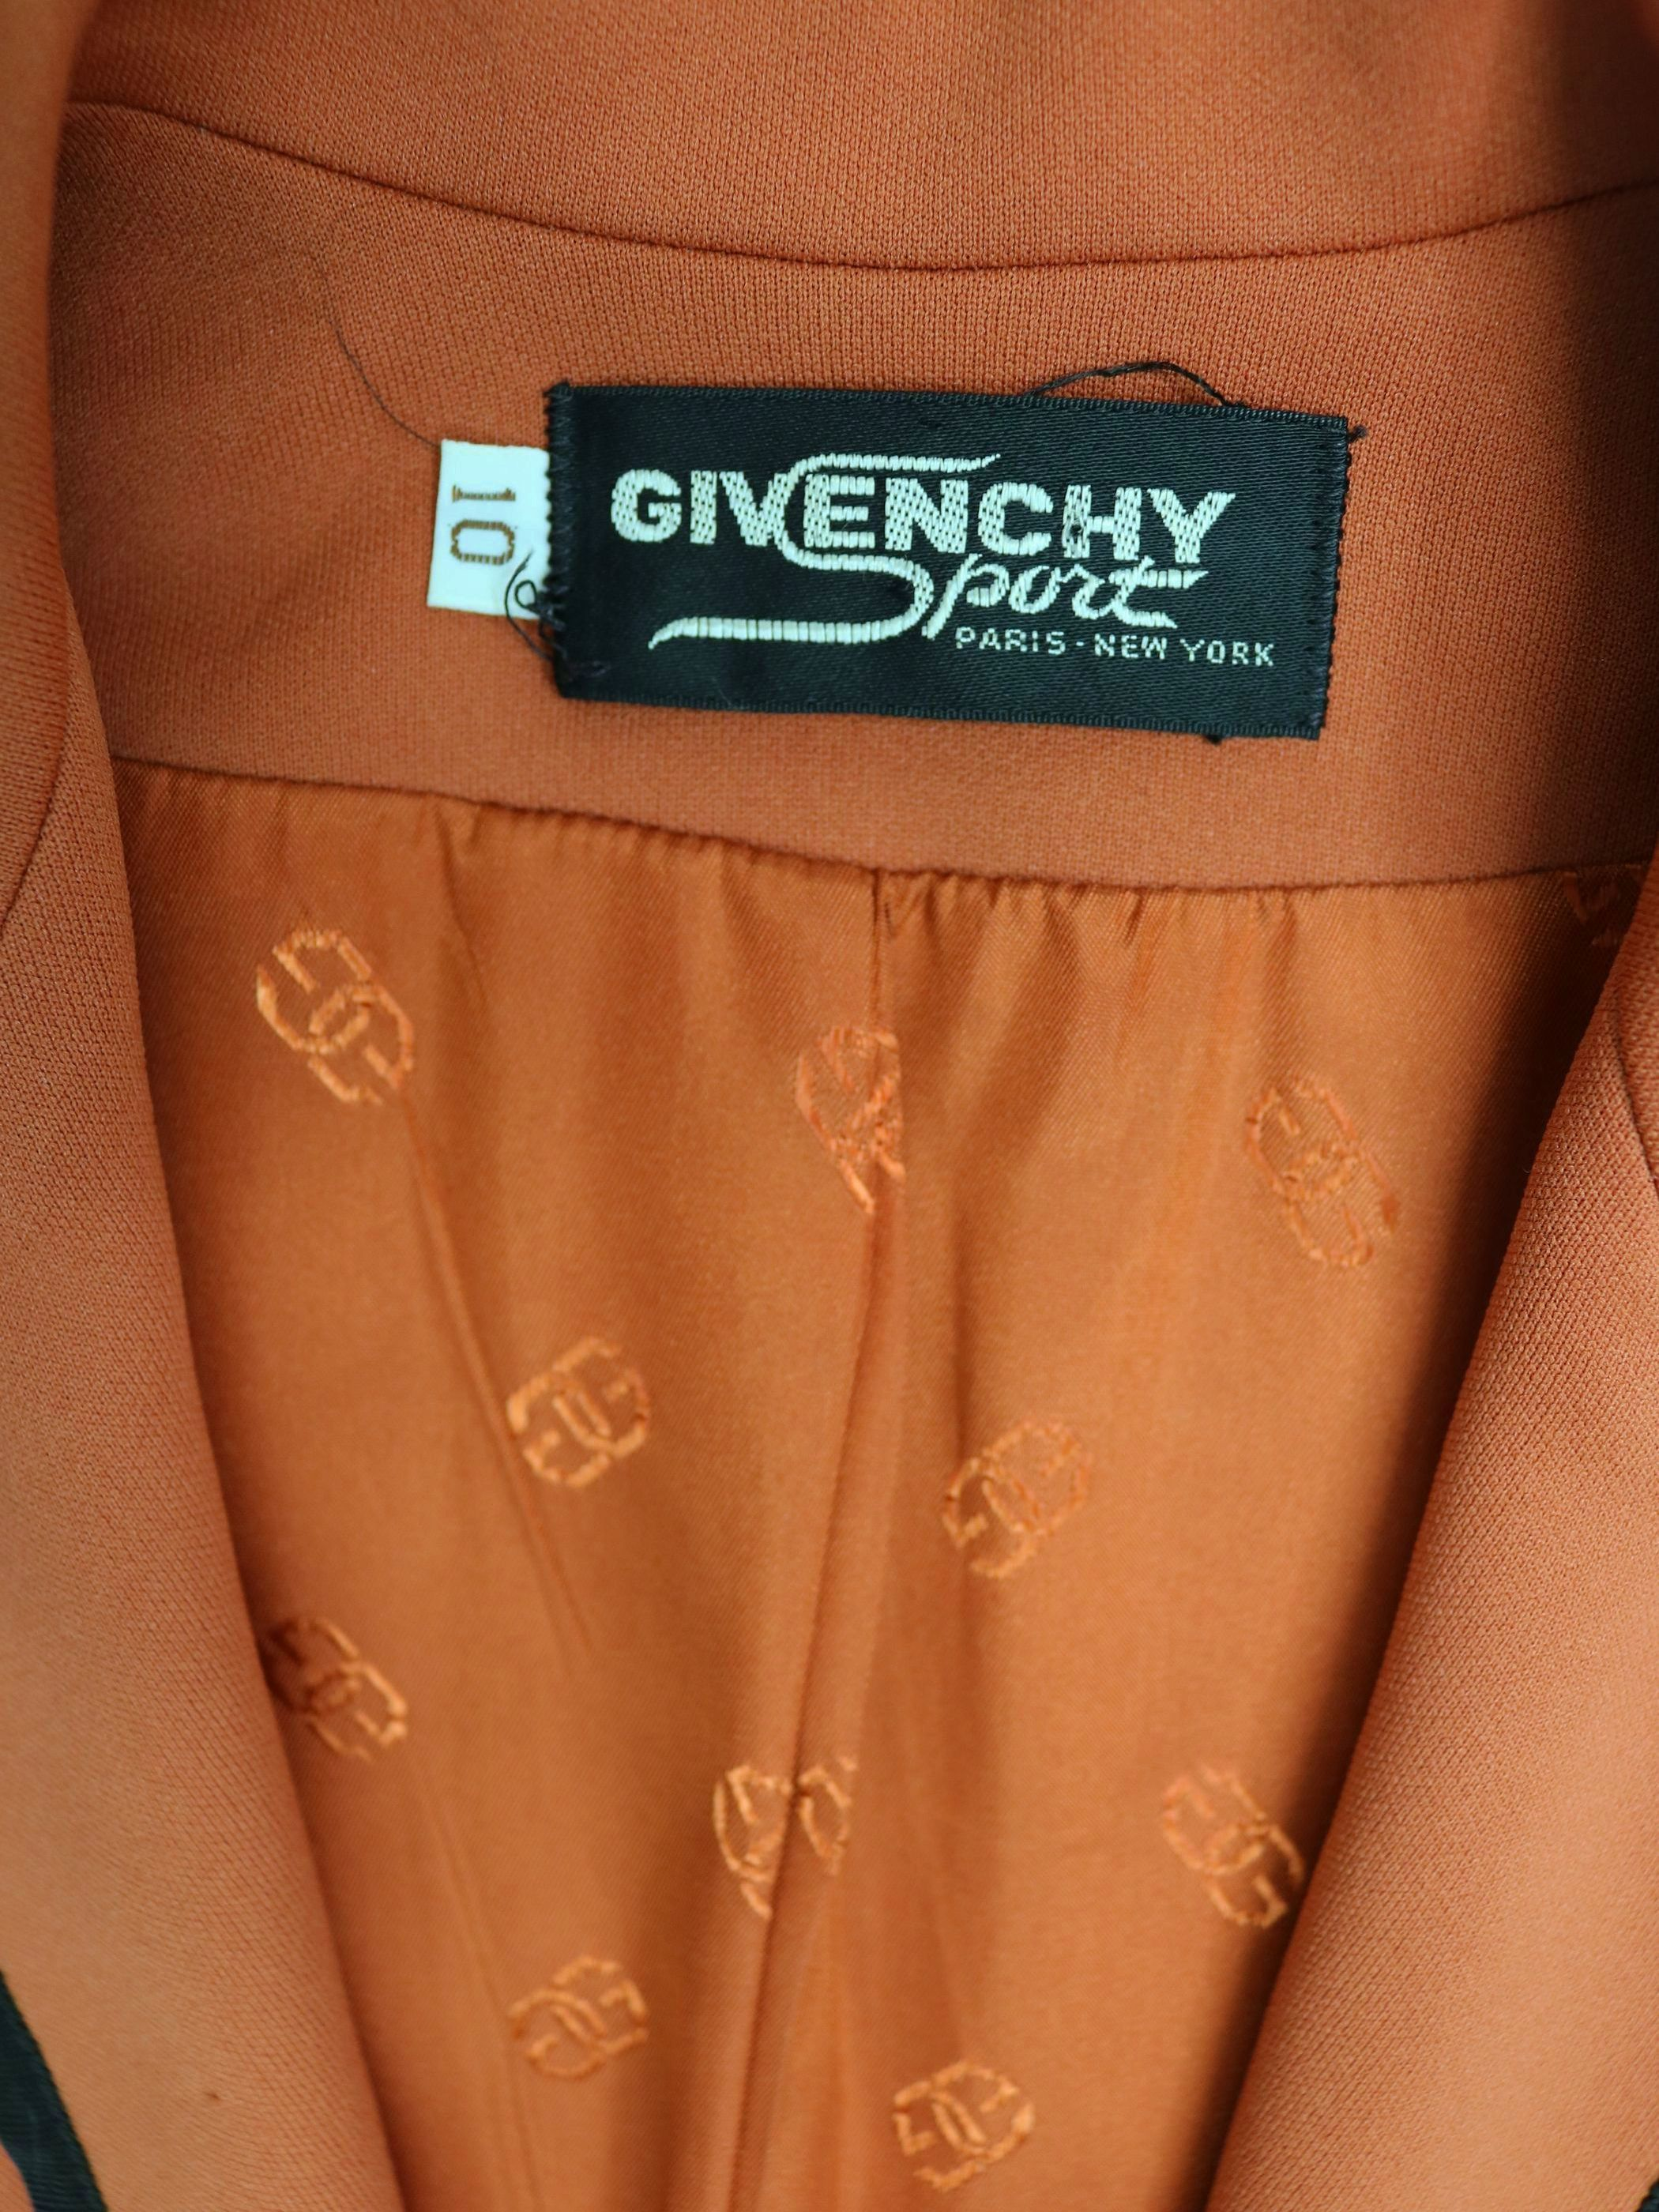 1970's / GIVENCHY Sport Vintage Jacket